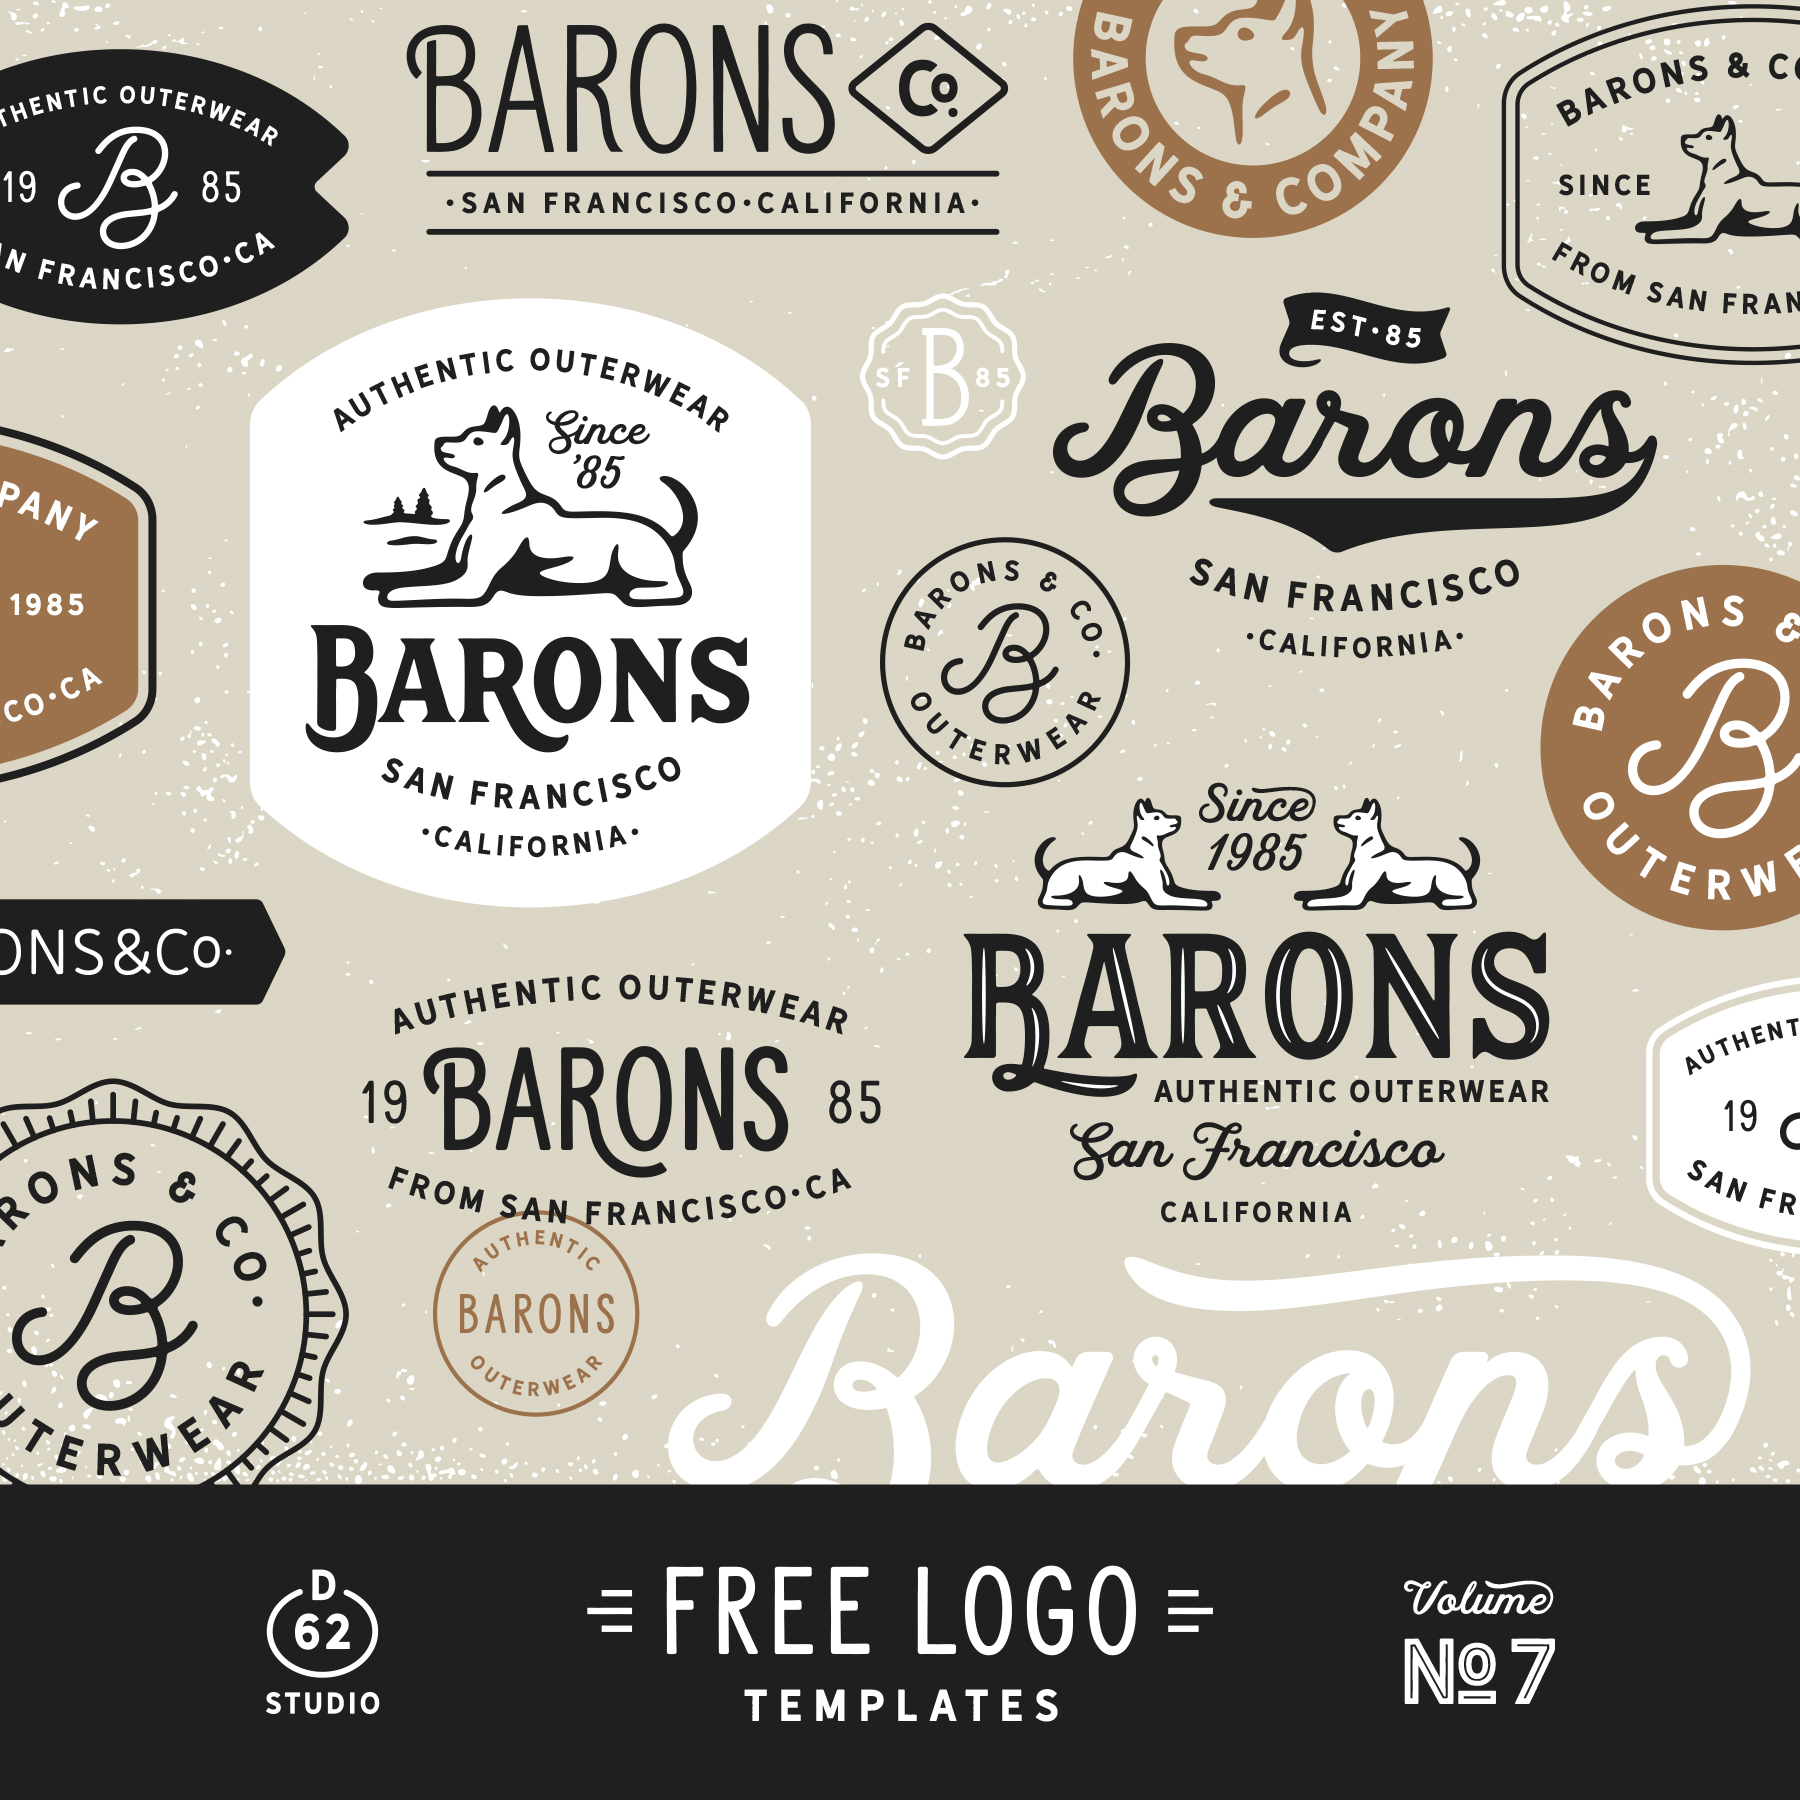 D62 Free Logo Temlates Vol 7